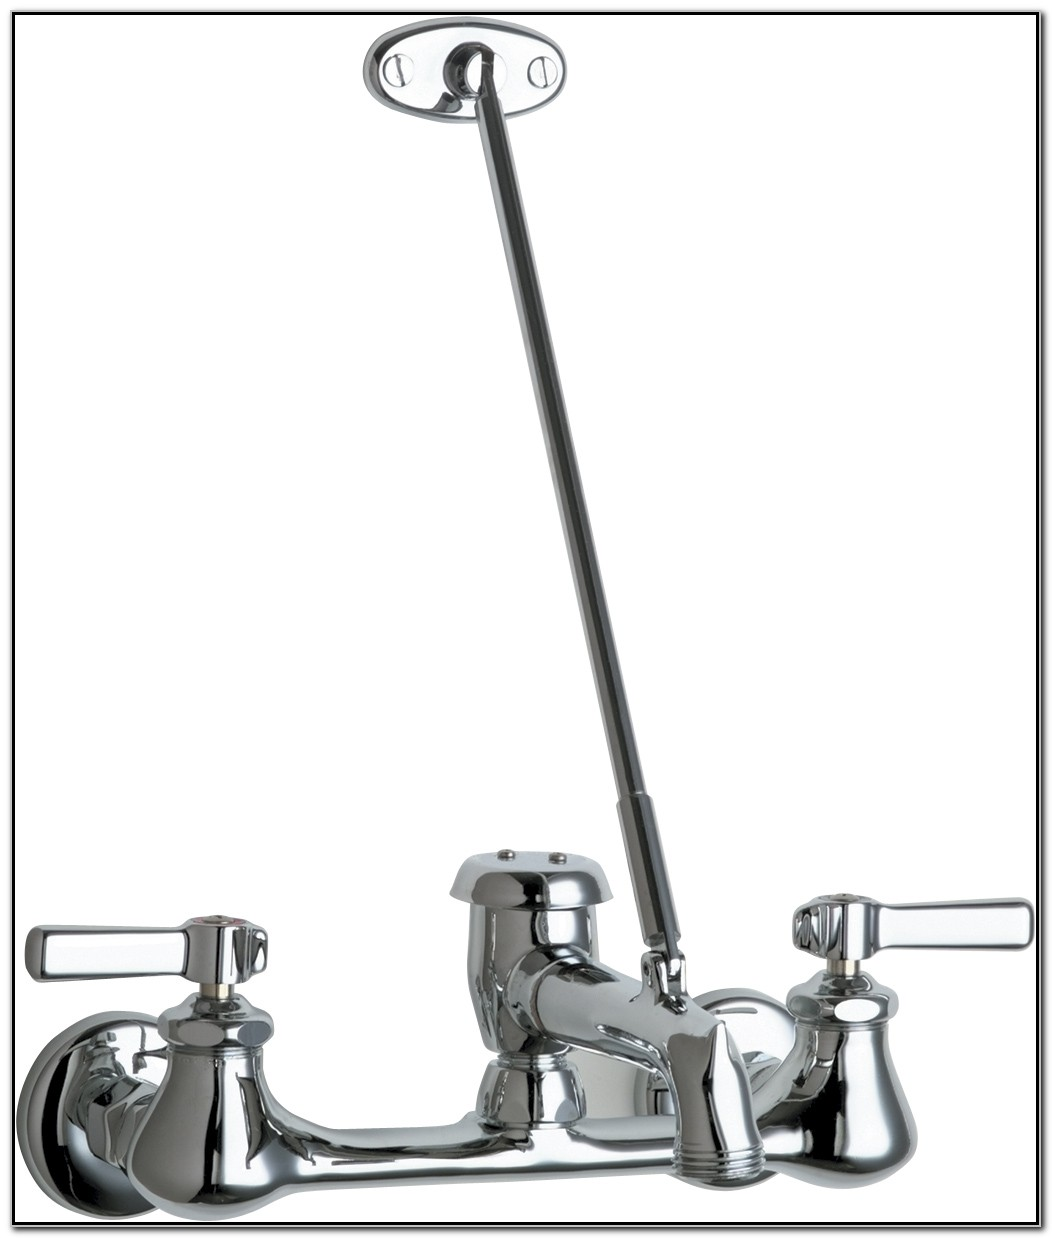 Chicago Mop Sink Faucet